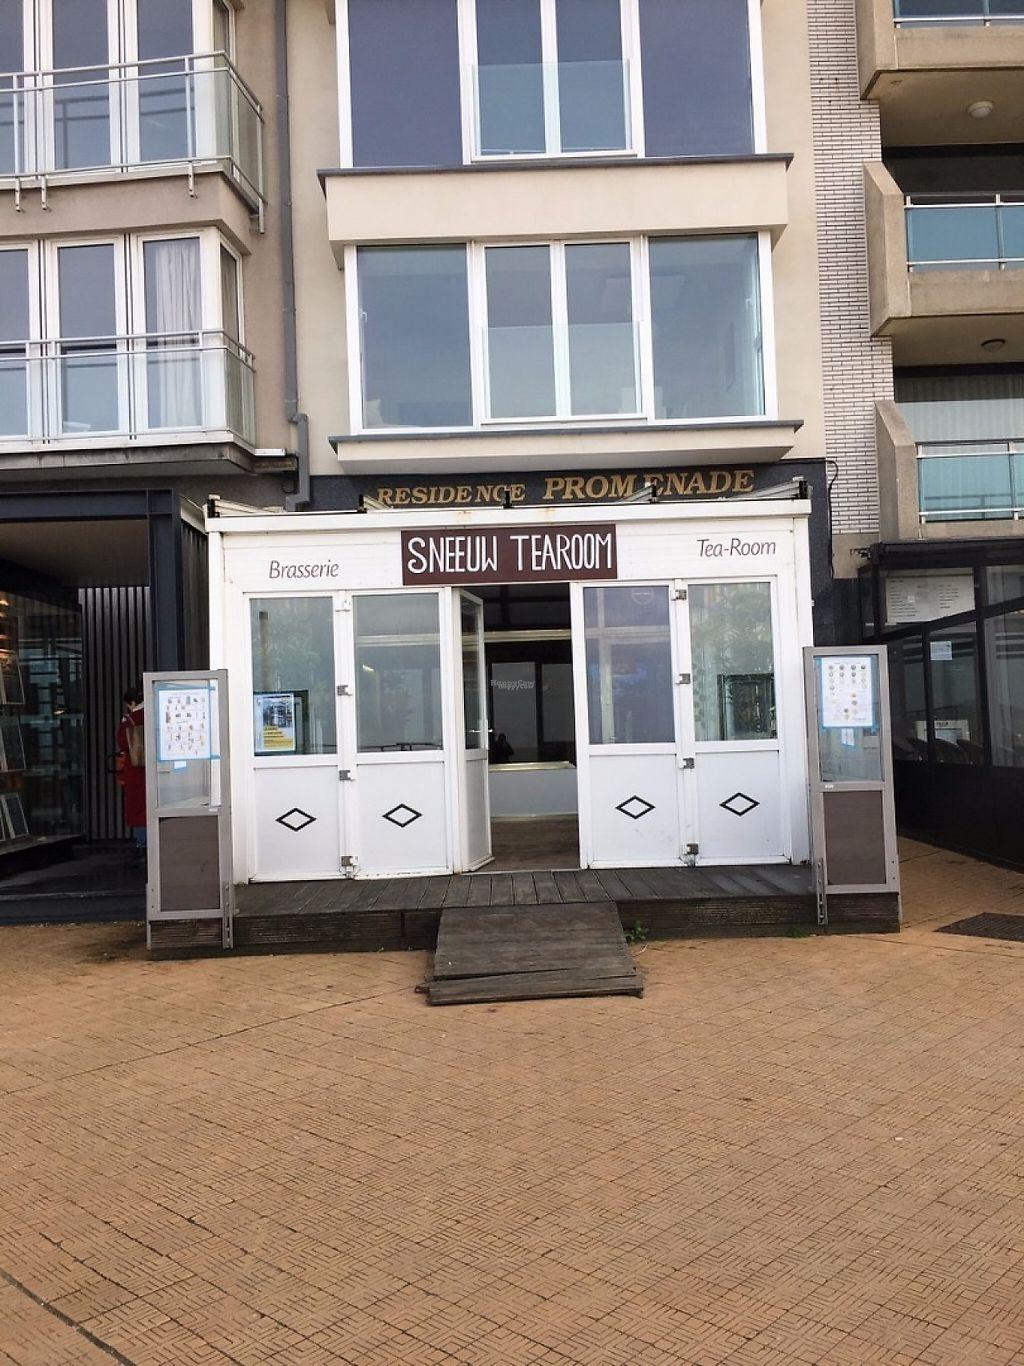 "Photo of Sneeuw Tearoom  by <a href=""/members/profile/VeggieGastronaut"">VeggieGastronaut</a> <br/>Storefront of Sneeuw Tearoom <br/> November 16, 2016  - <a href='/contact/abuse/image/65979/190956'>Report</a>"